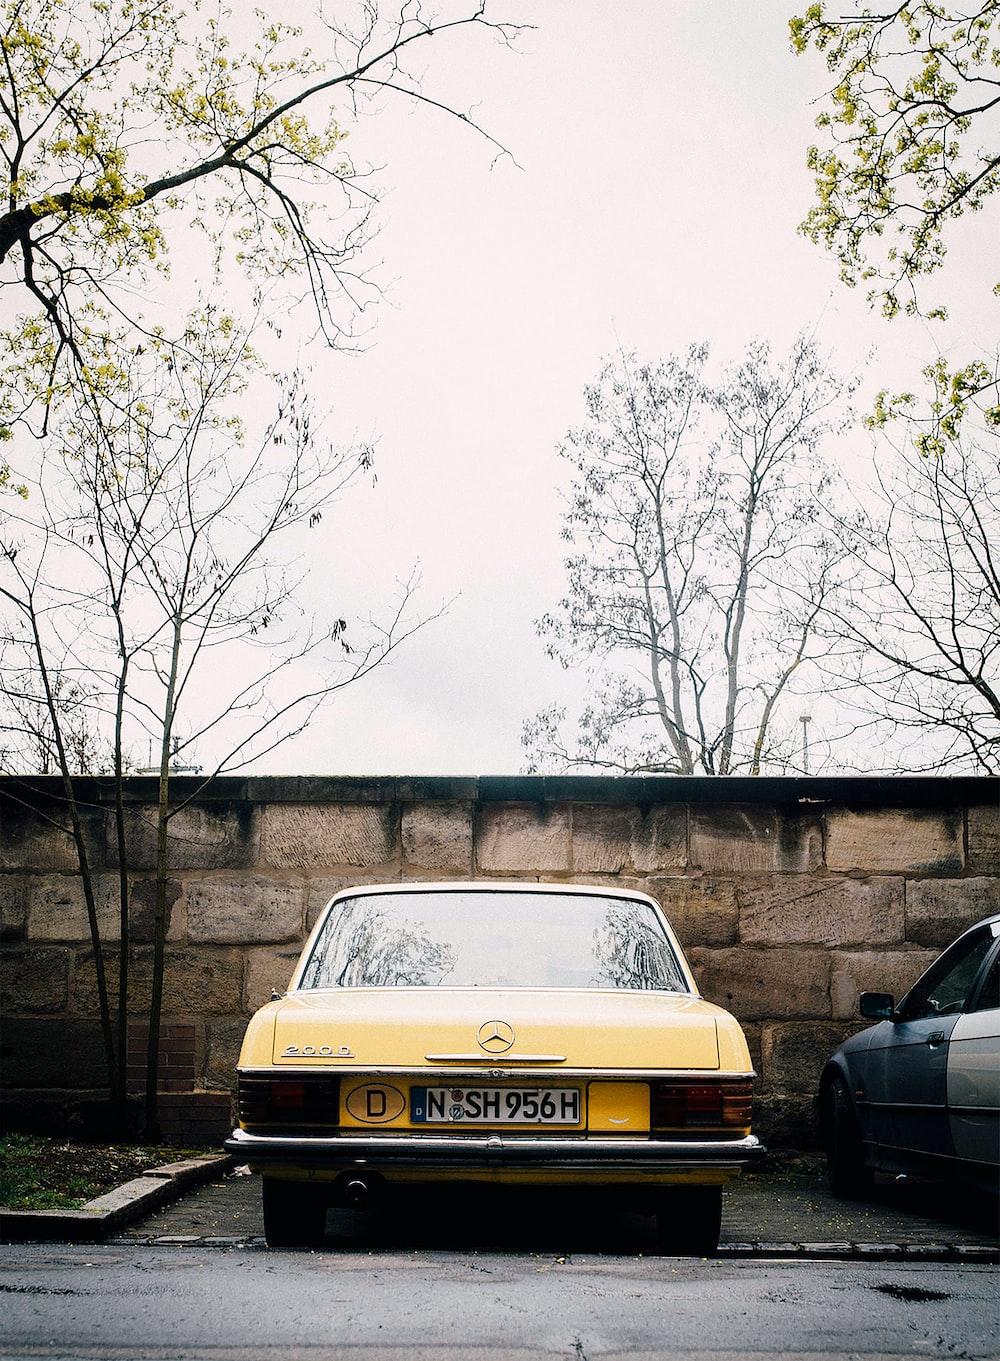 yellow Mercedes-Benz vehicle